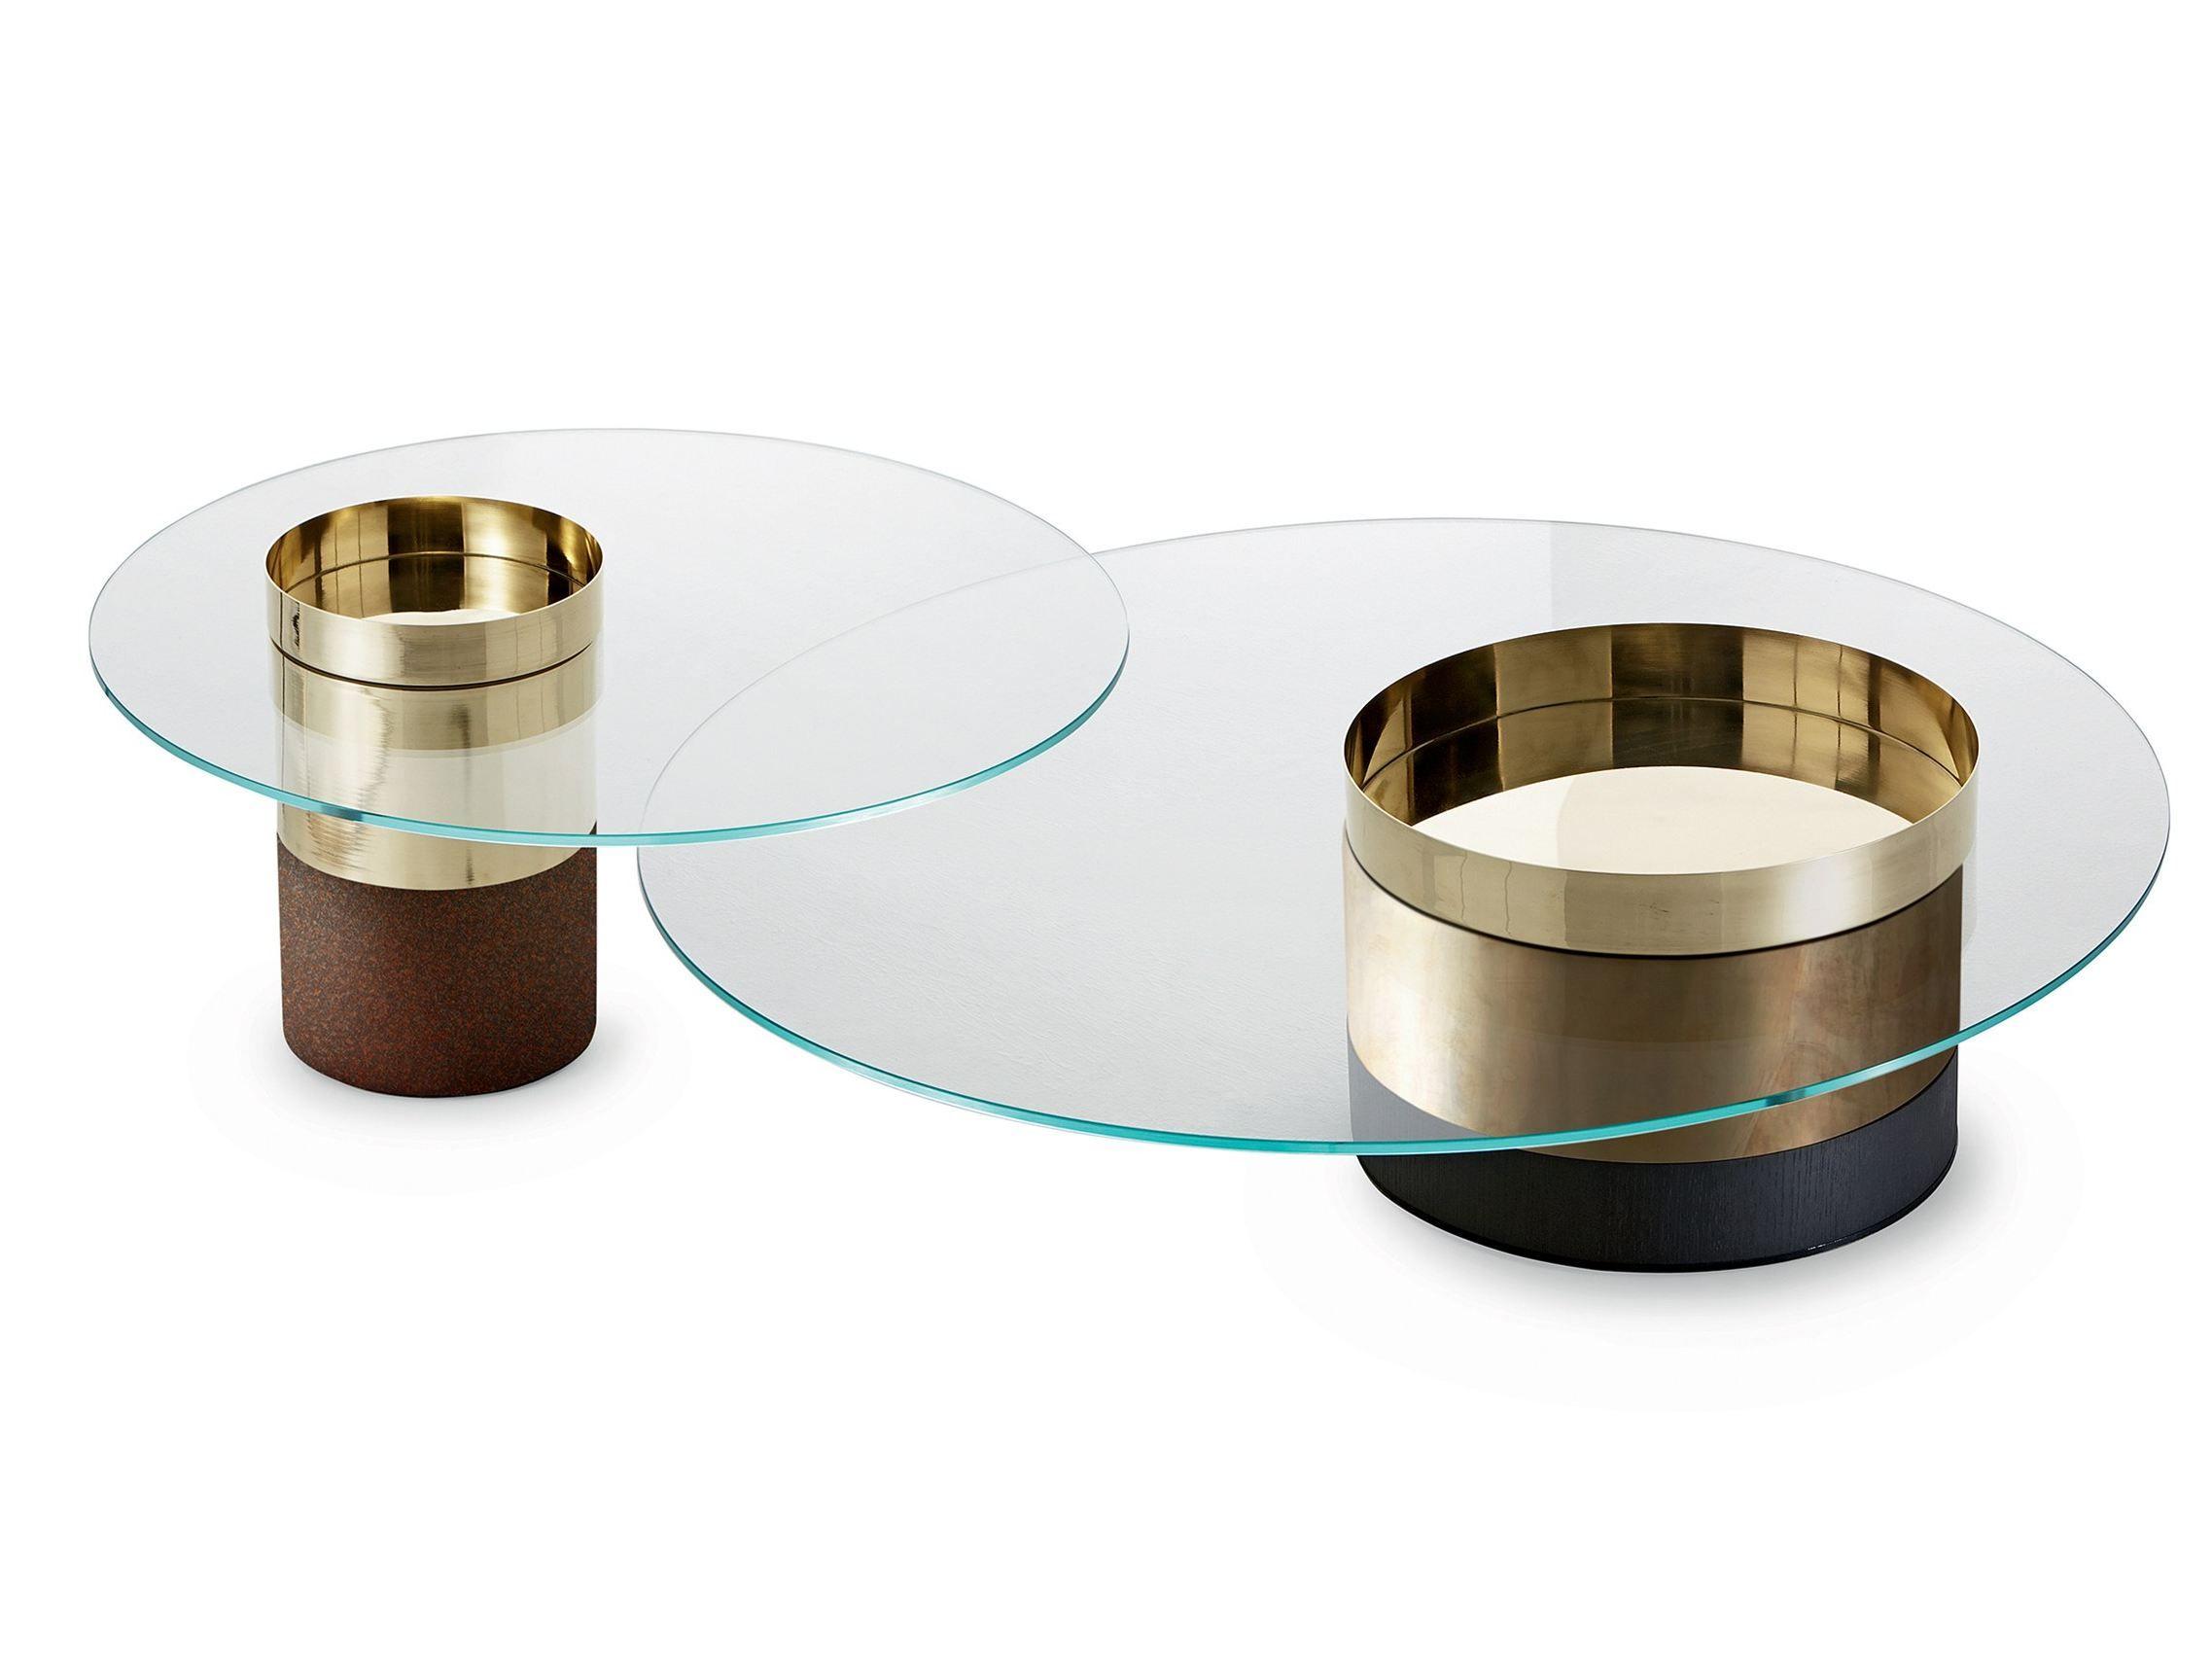 haumea low coffee table by gallotti radice design massimo castagna. Black Bedroom Furniture Sets. Home Design Ideas